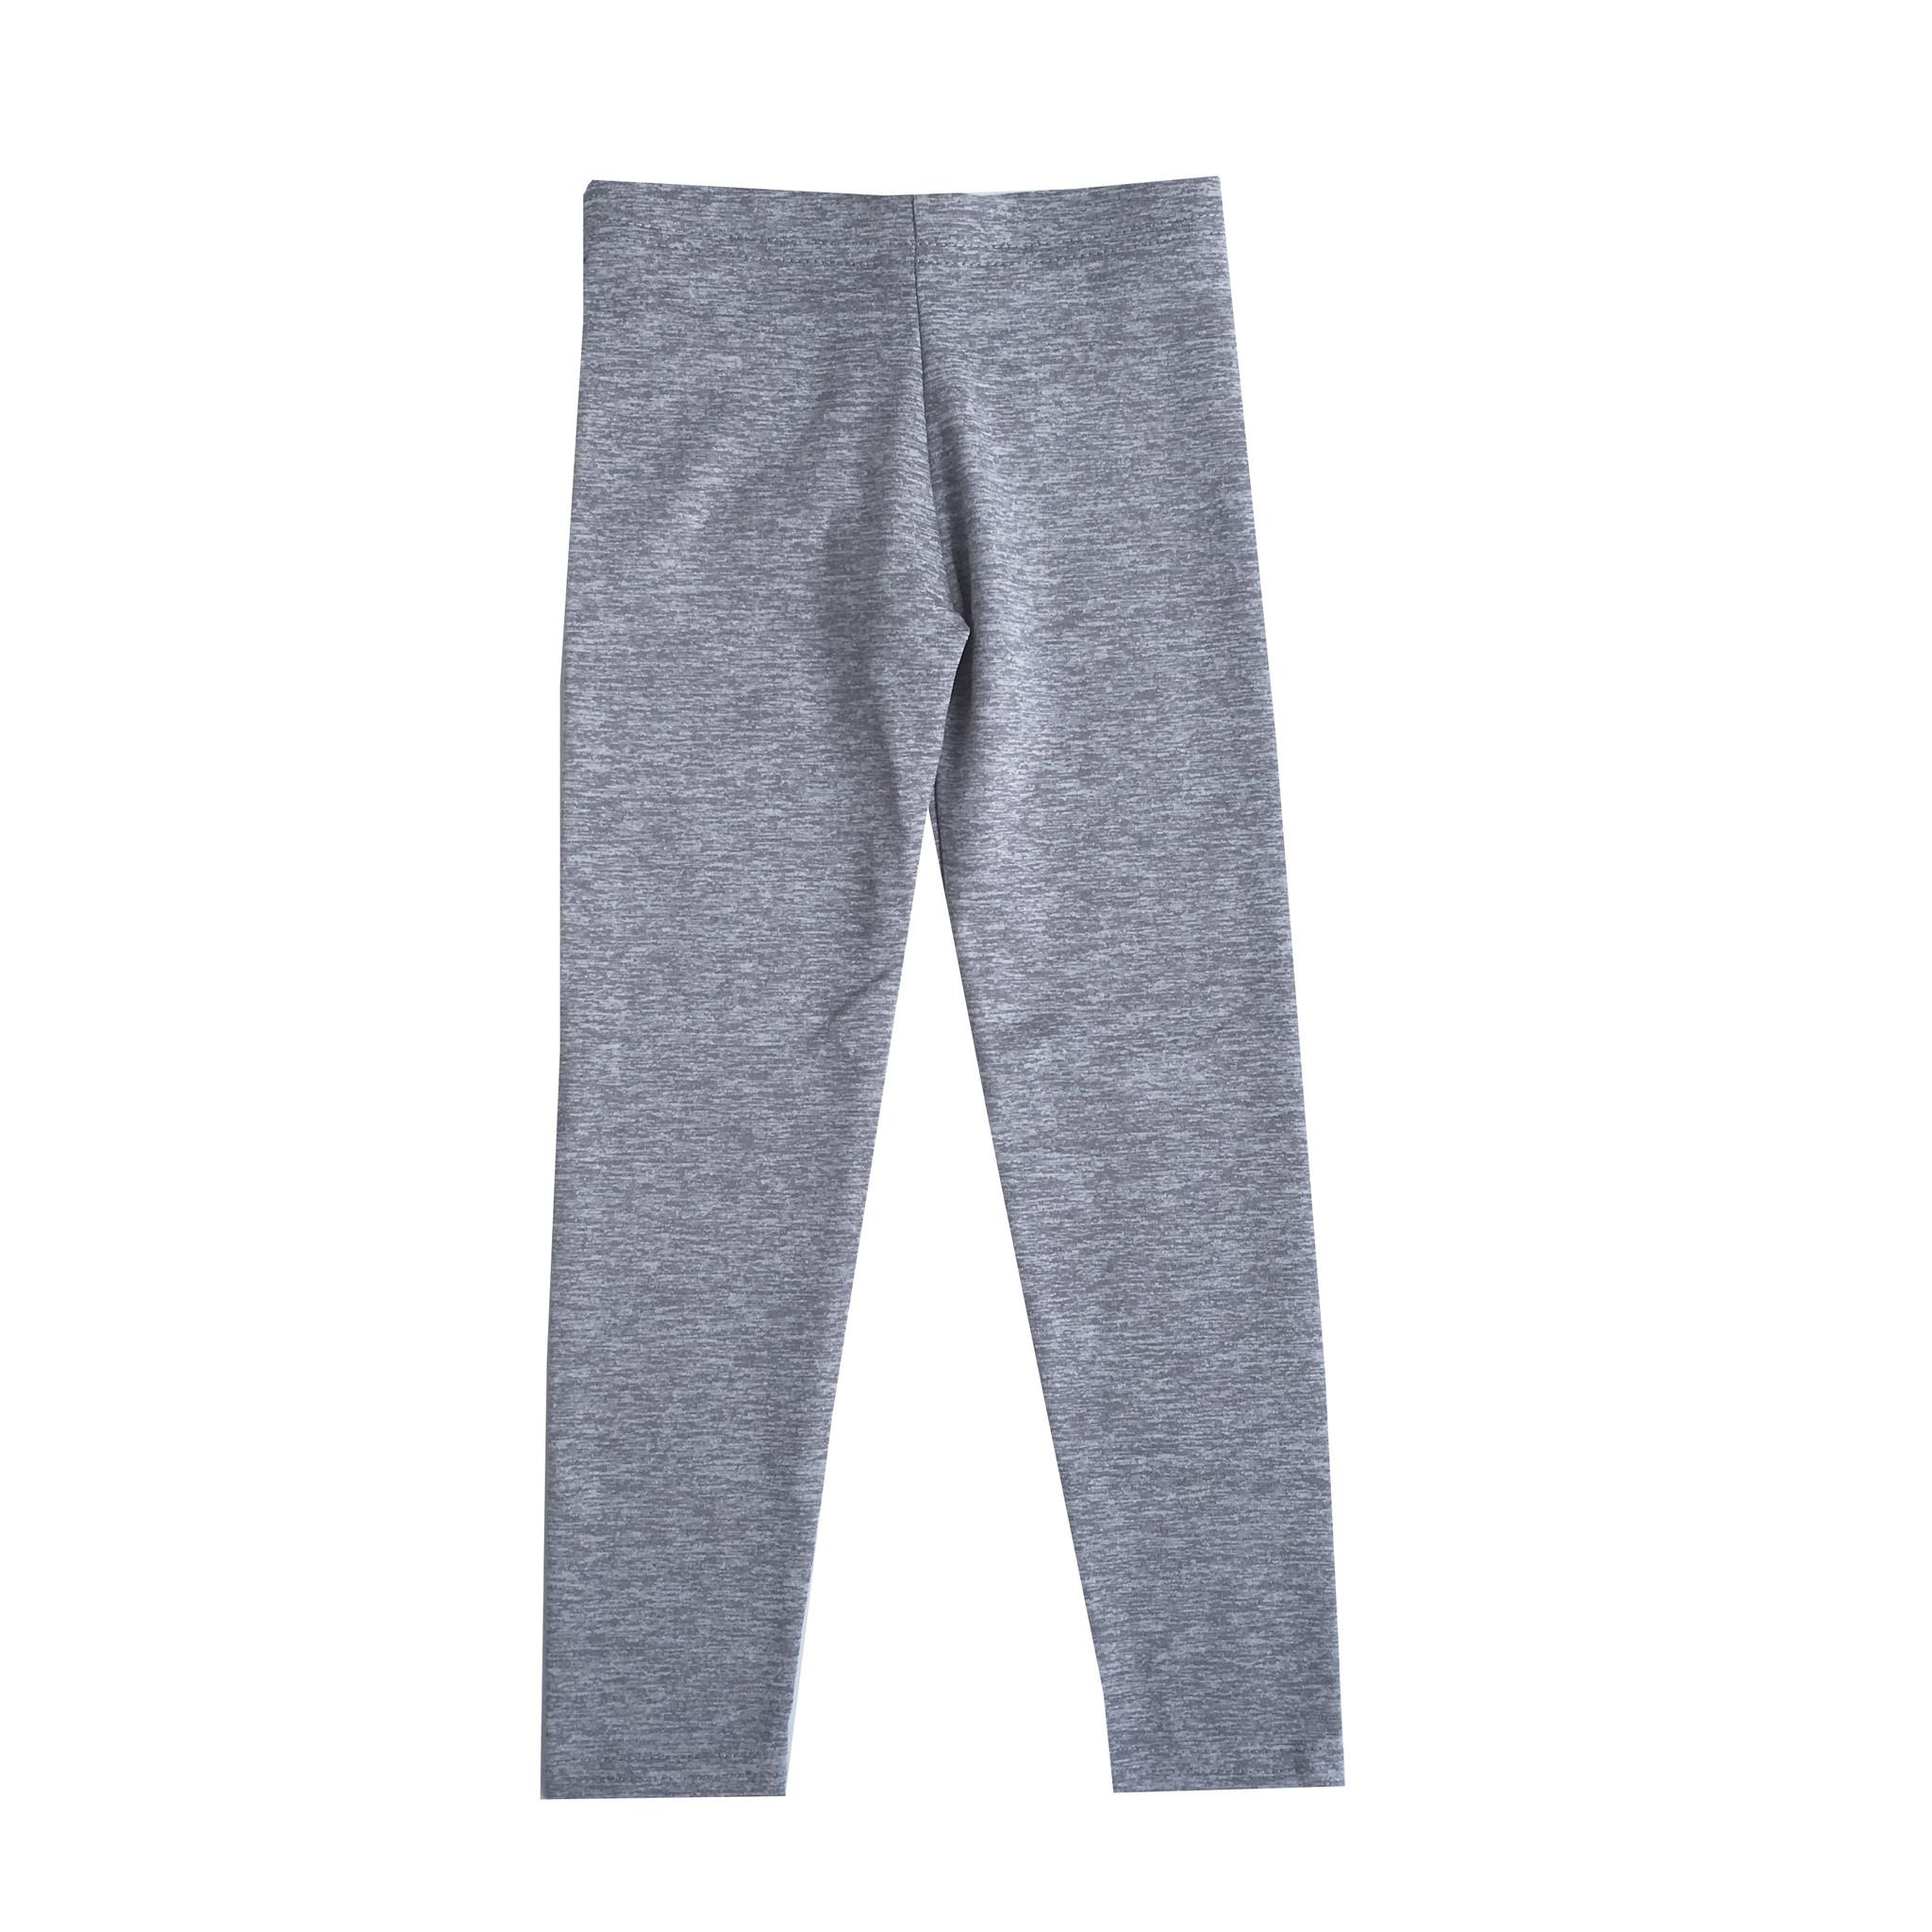 Dori Grey/White Heathered Legging